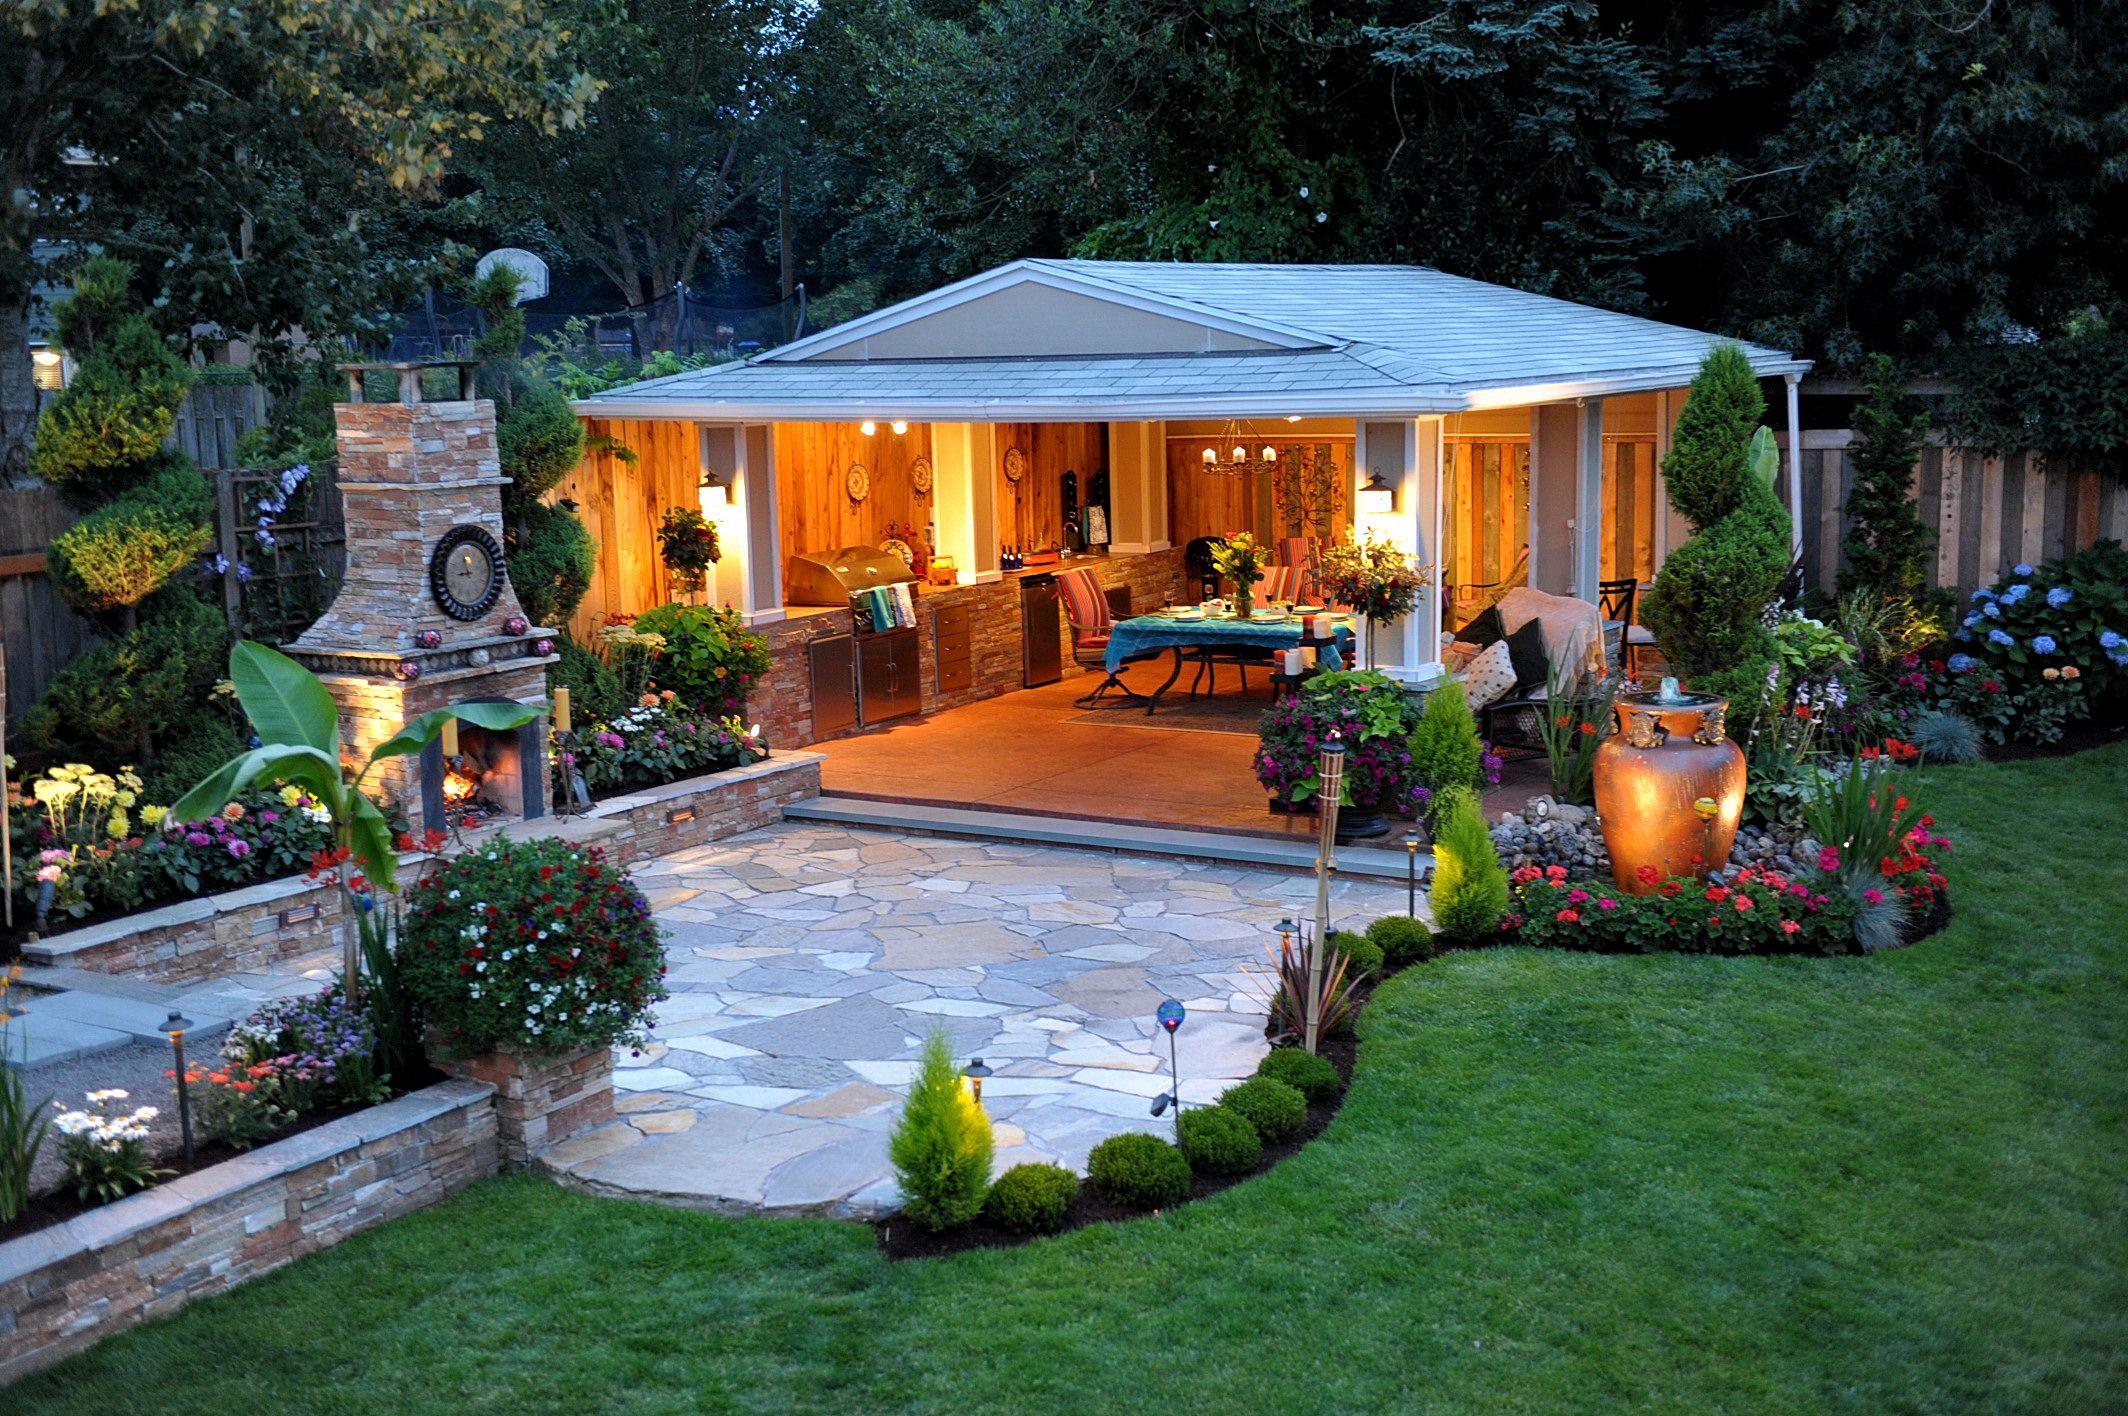 Need A Living Room Makeover Jardines Modernos Diseno De Jardin Moderno Diseno De Patio